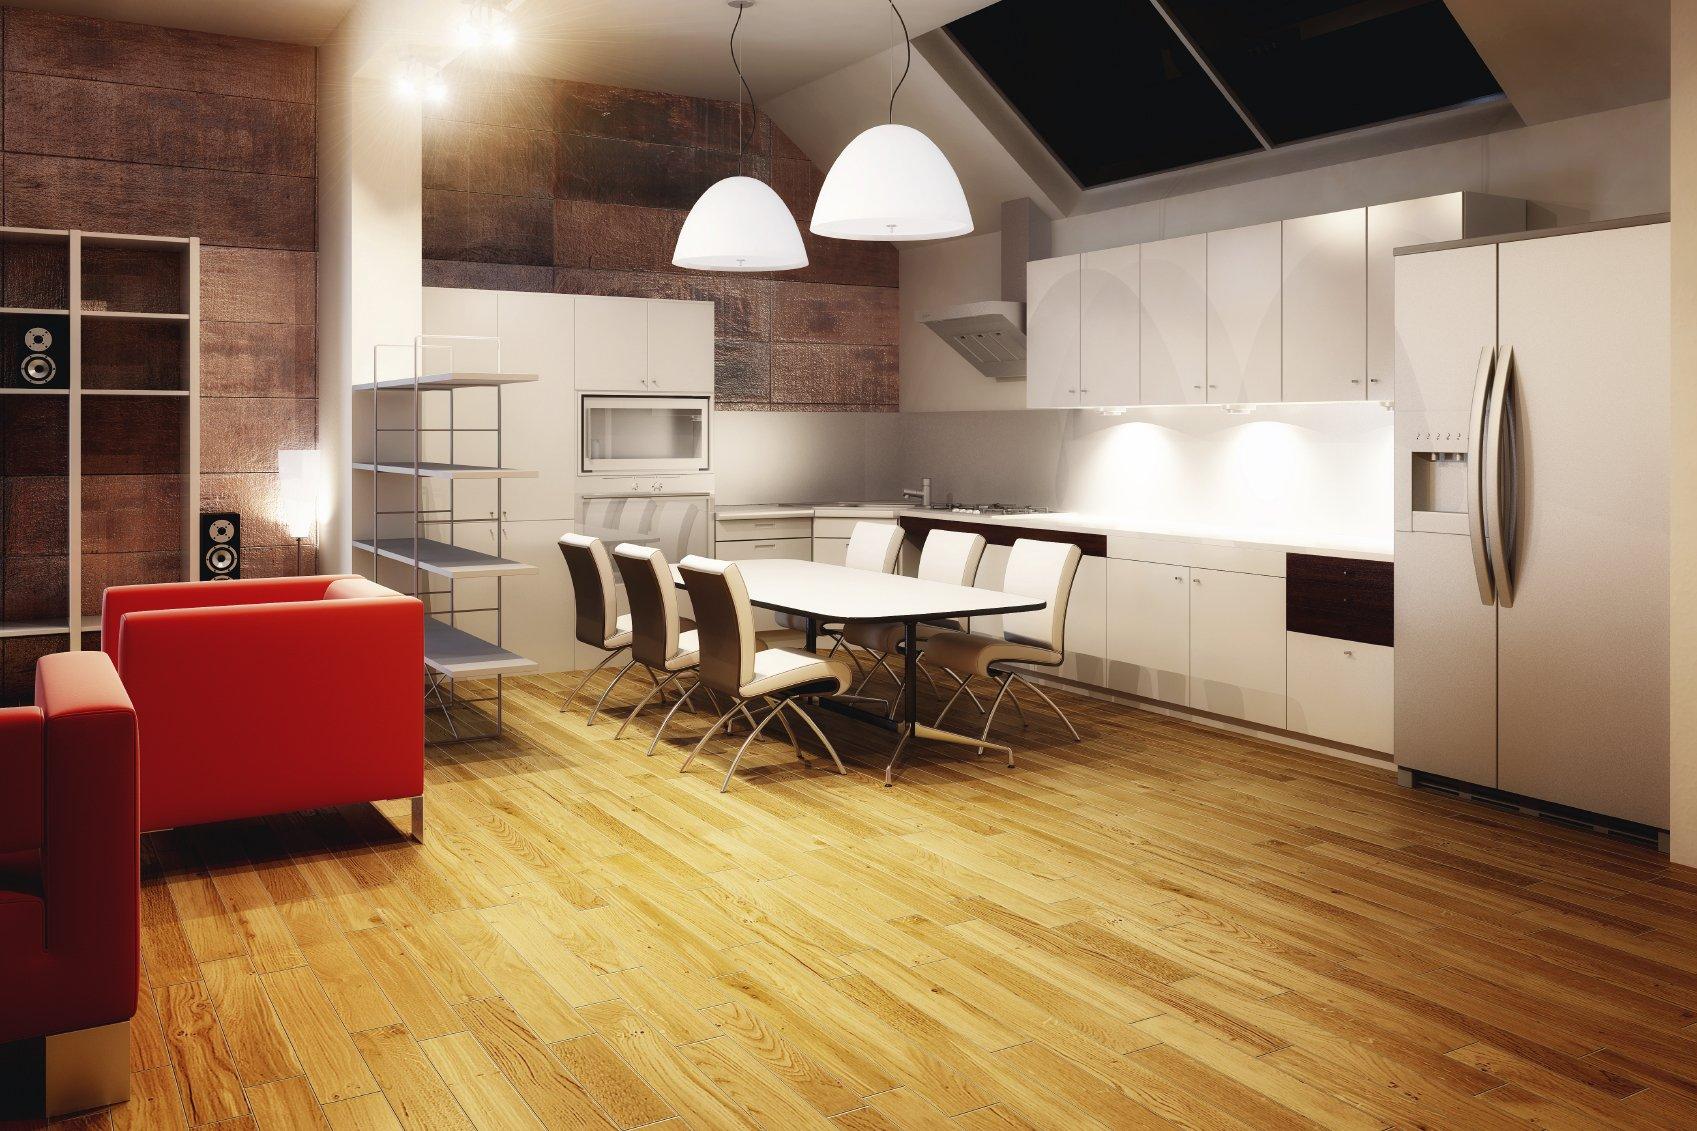 bewerten gutachten verkaufen isb m nchen immobilien. Black Bedroom Furniture Sets. Home Design Ideas